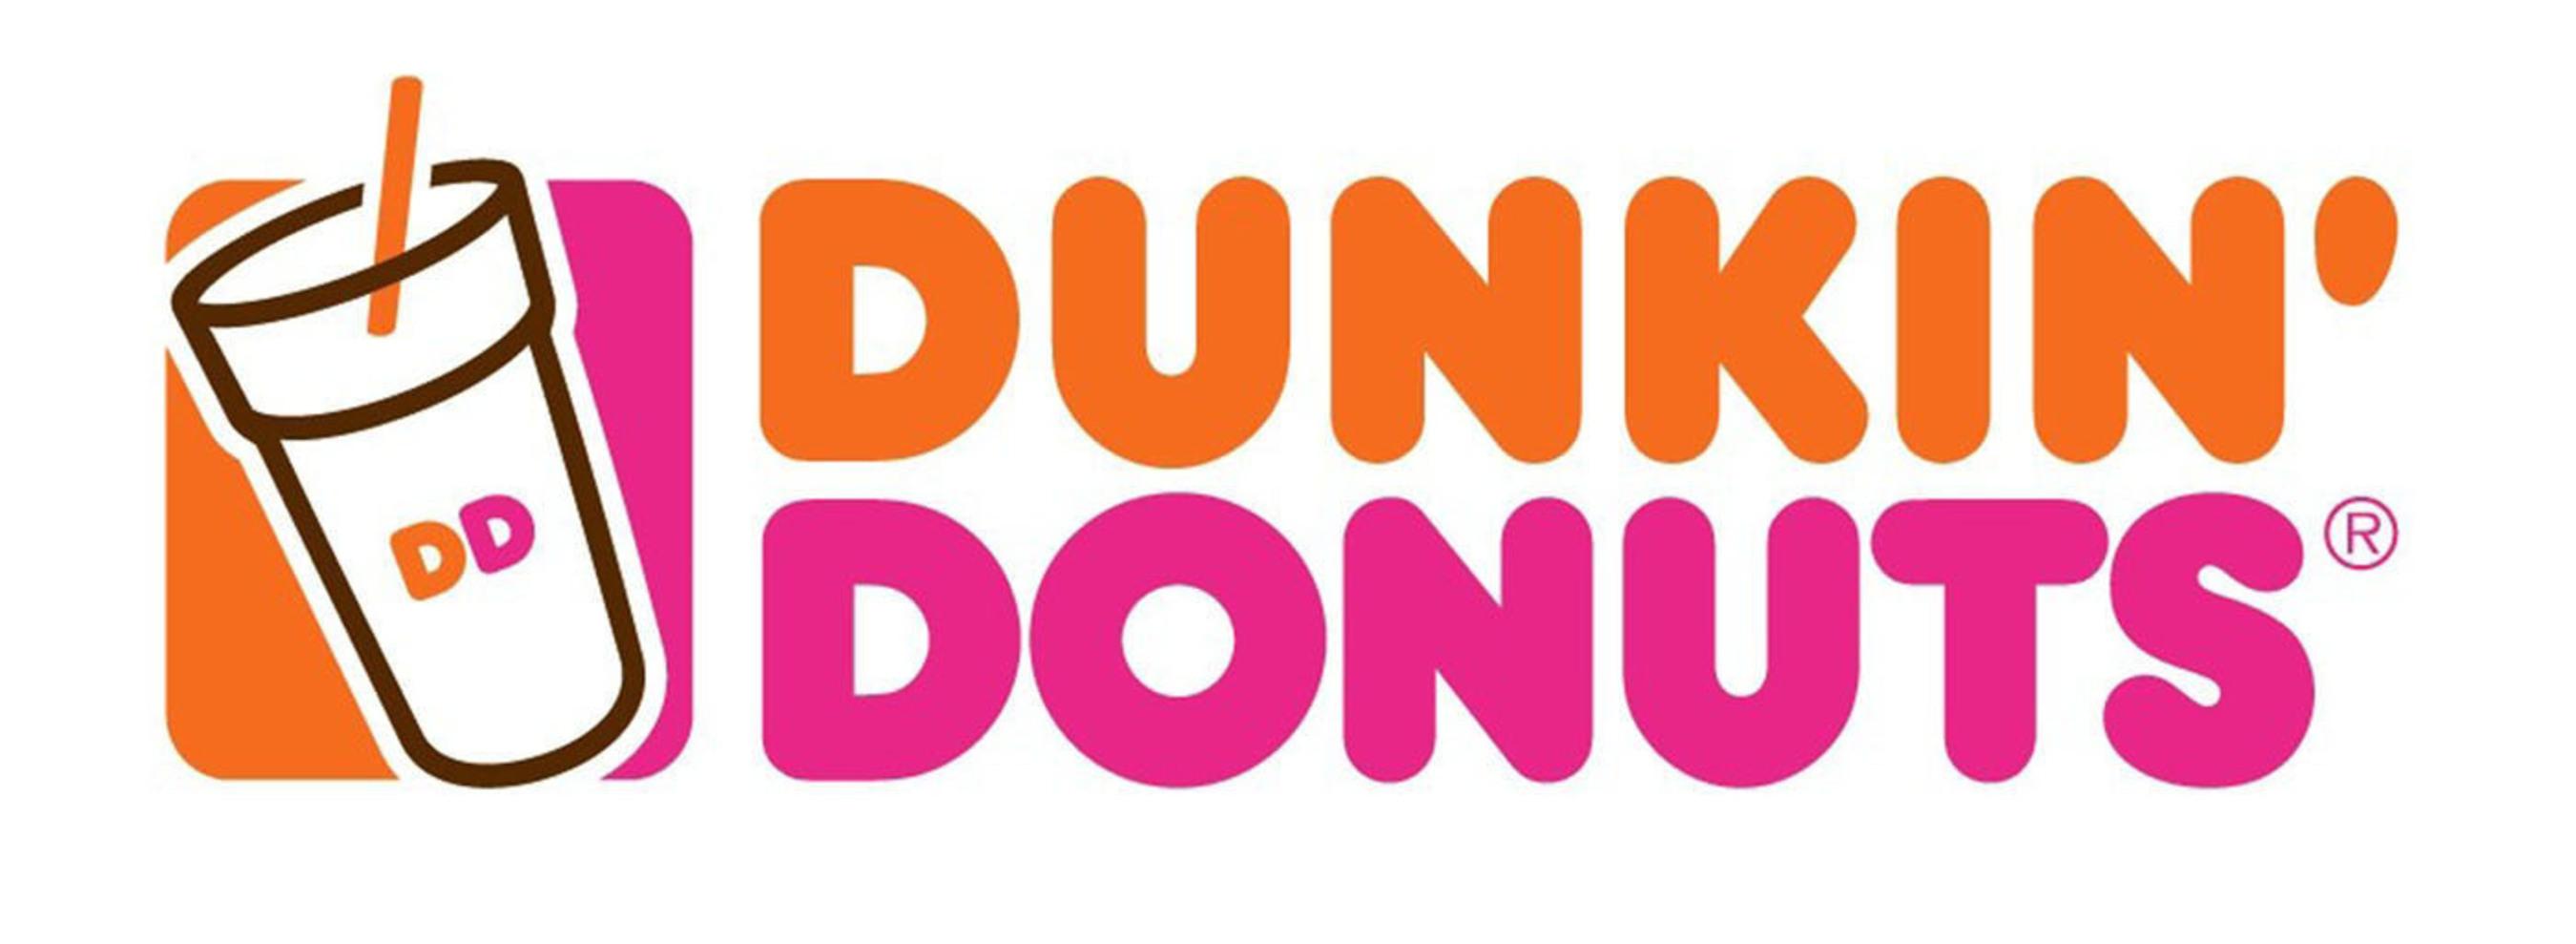 Dunkin' Donuts Cold logo.